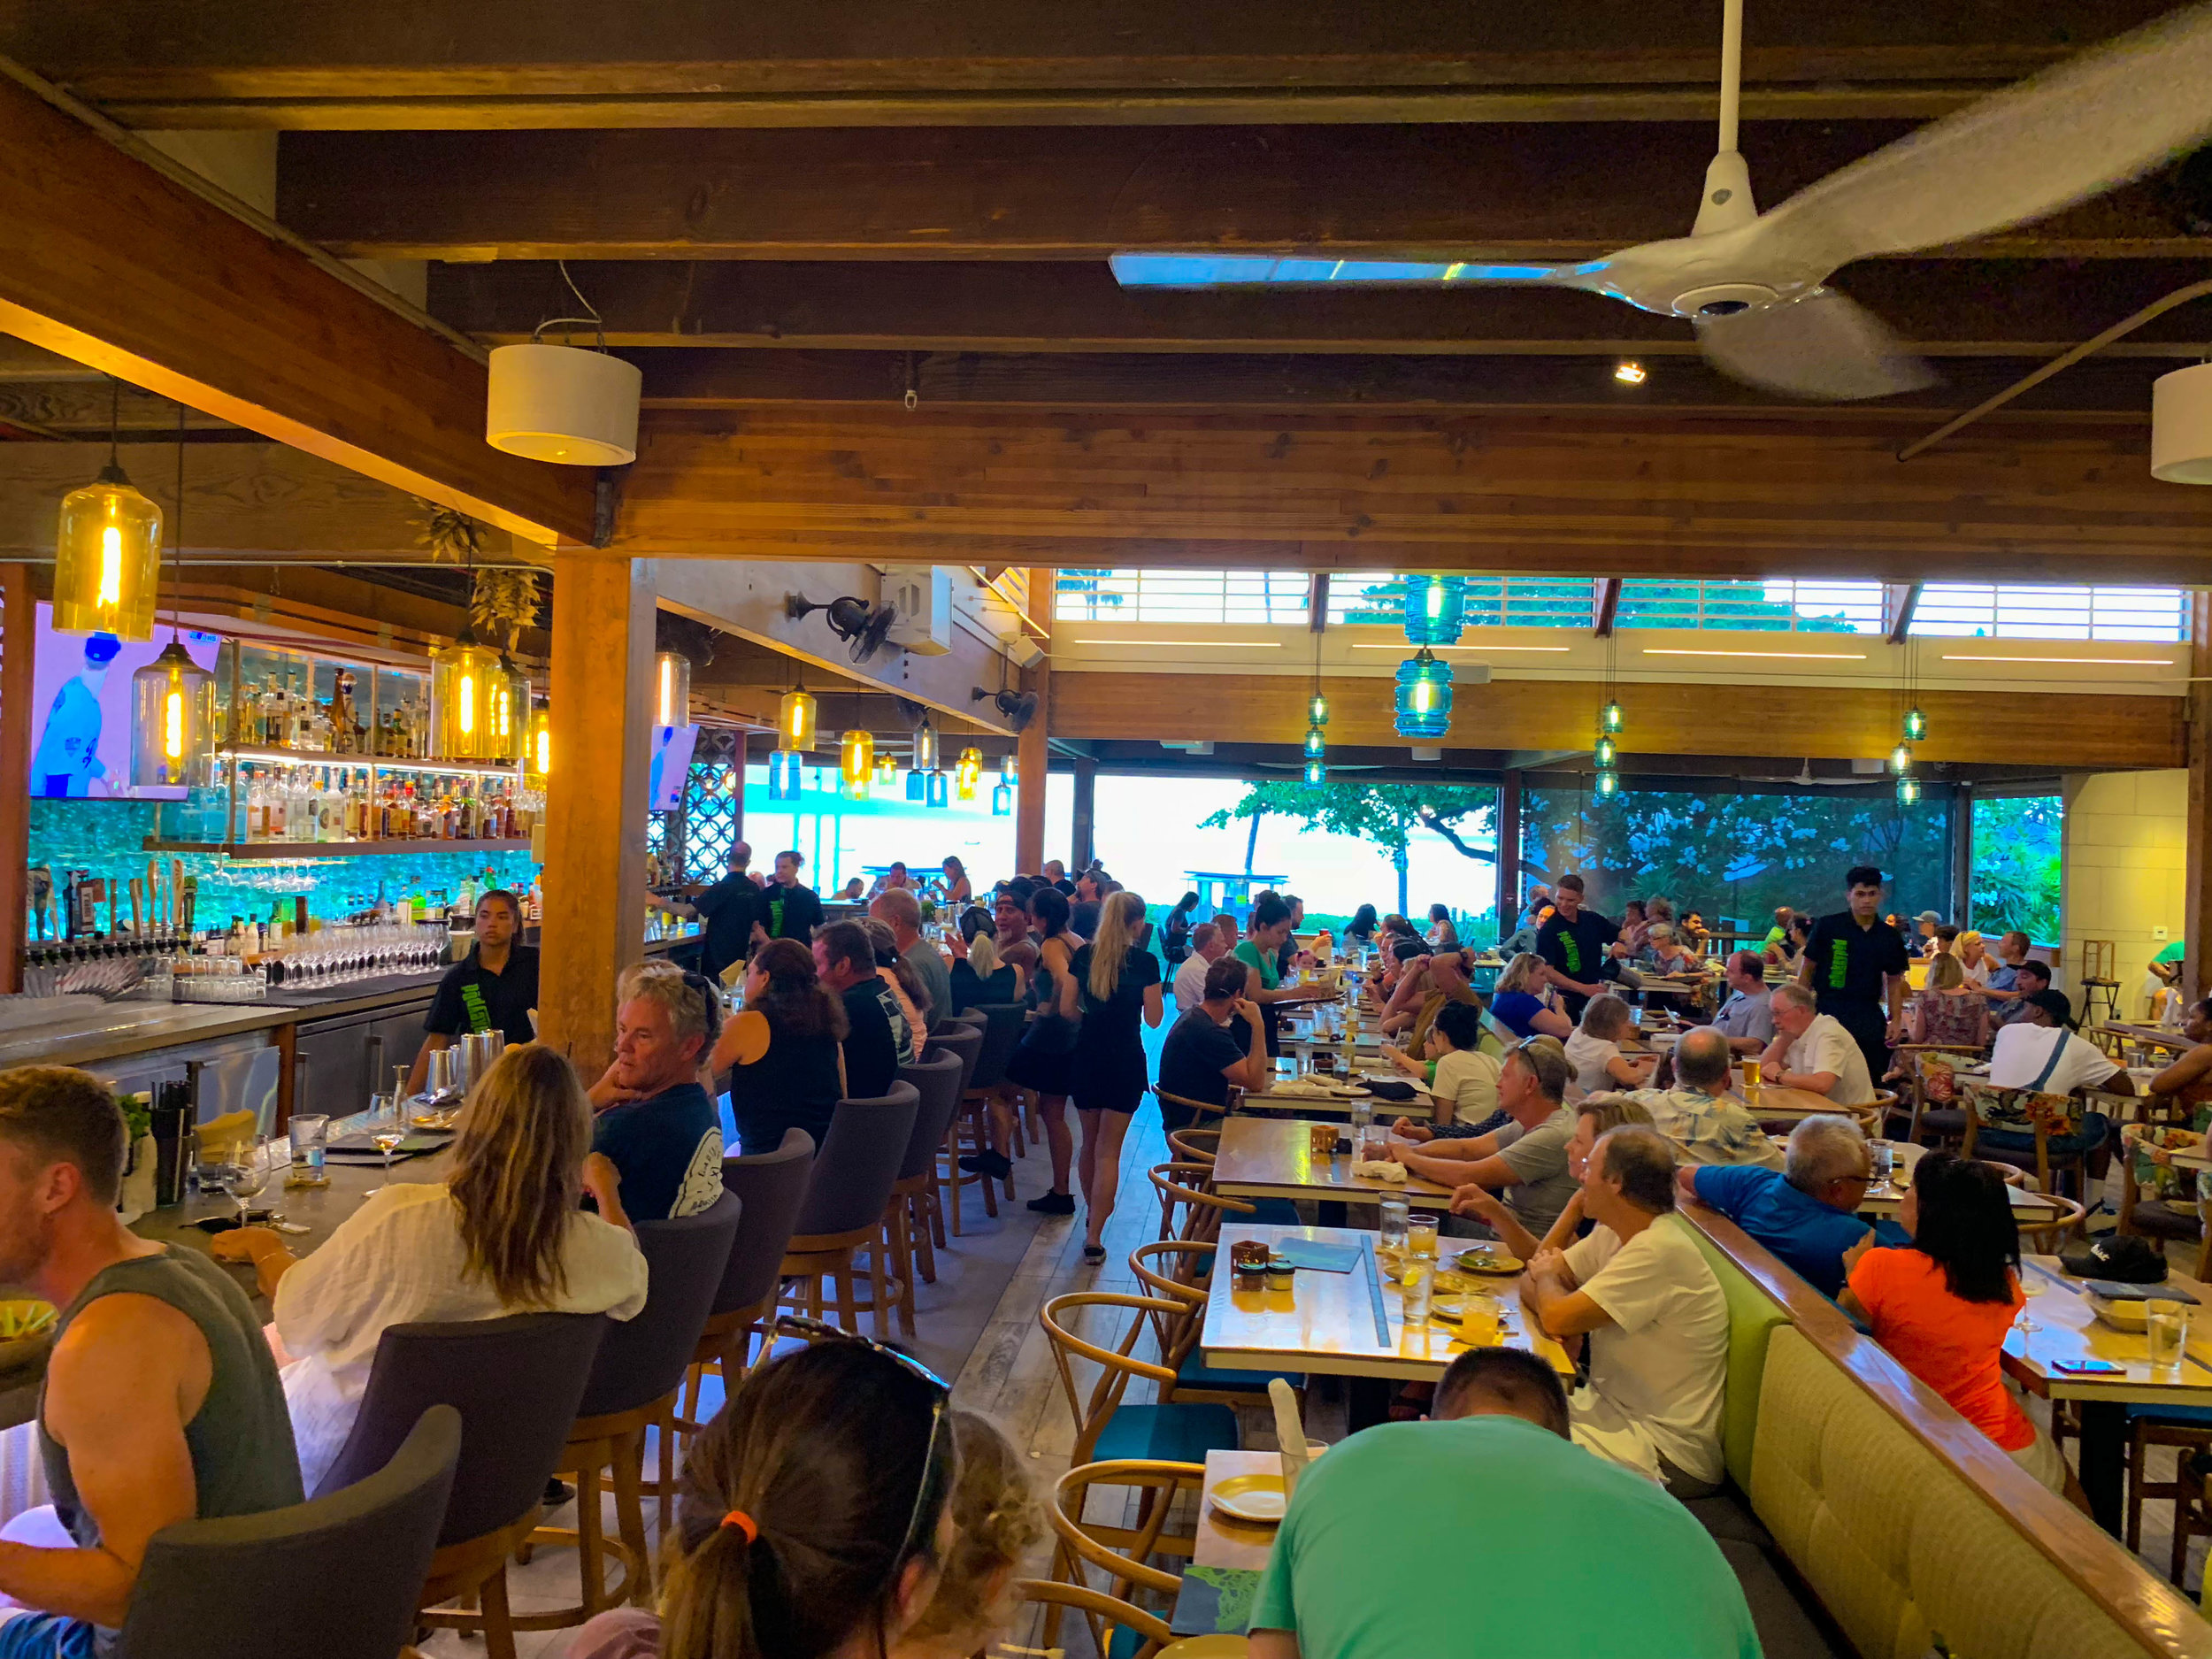 Monkeypod Kitchen Restaurant - Kaanapali Beach, Maui, Hawaii